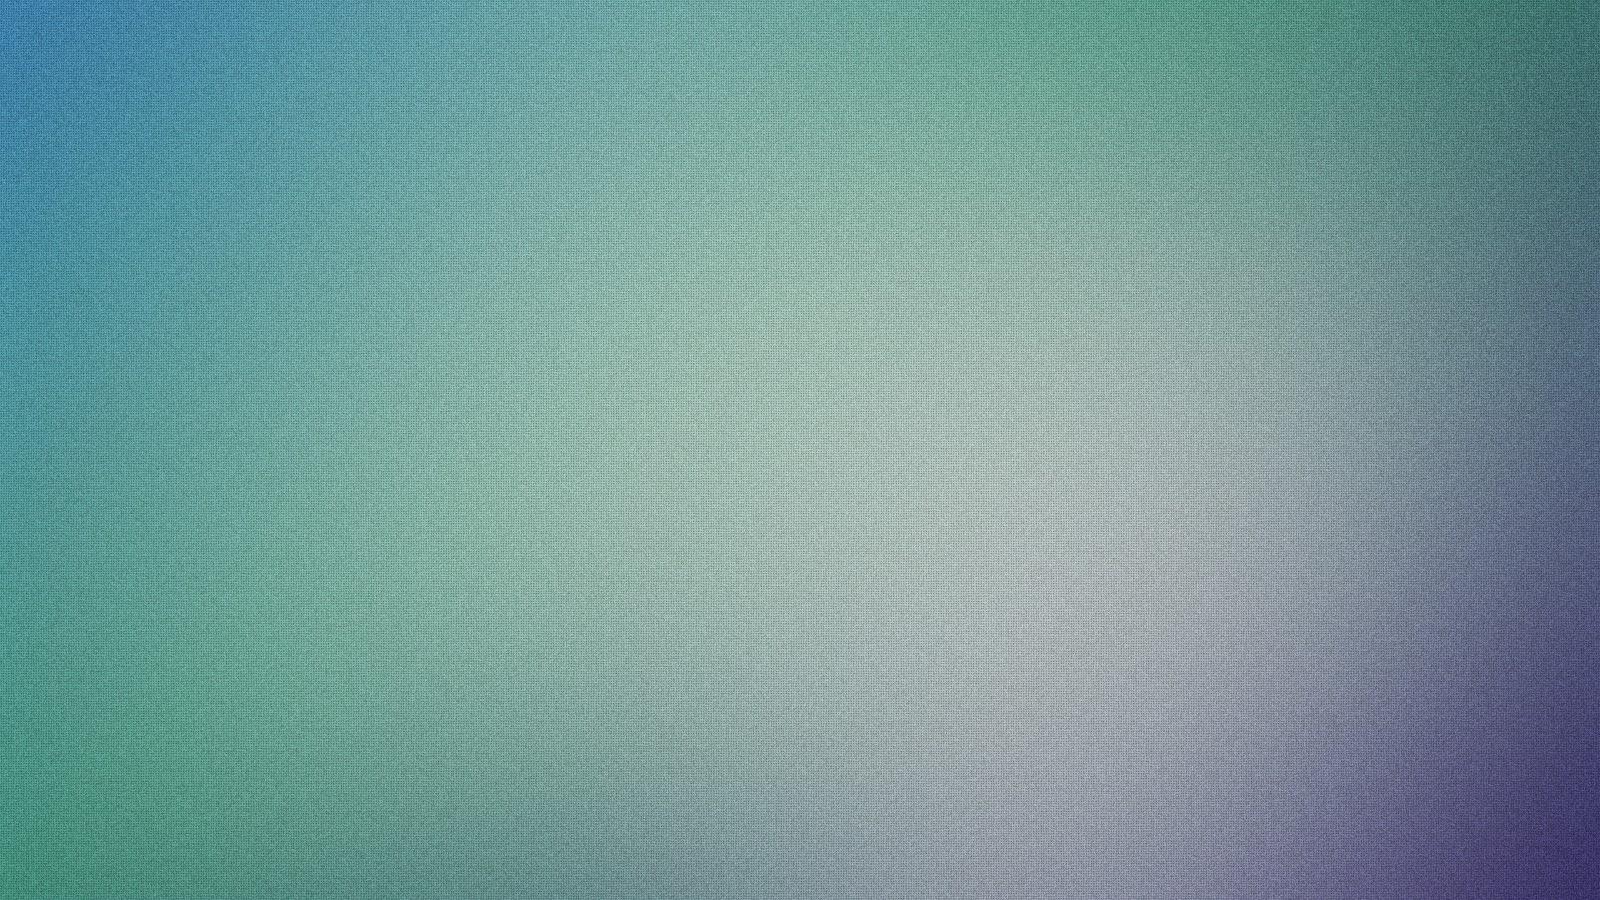 Light Textured Blue Gradient Background Powerpoint Templates Hd Spellshakti